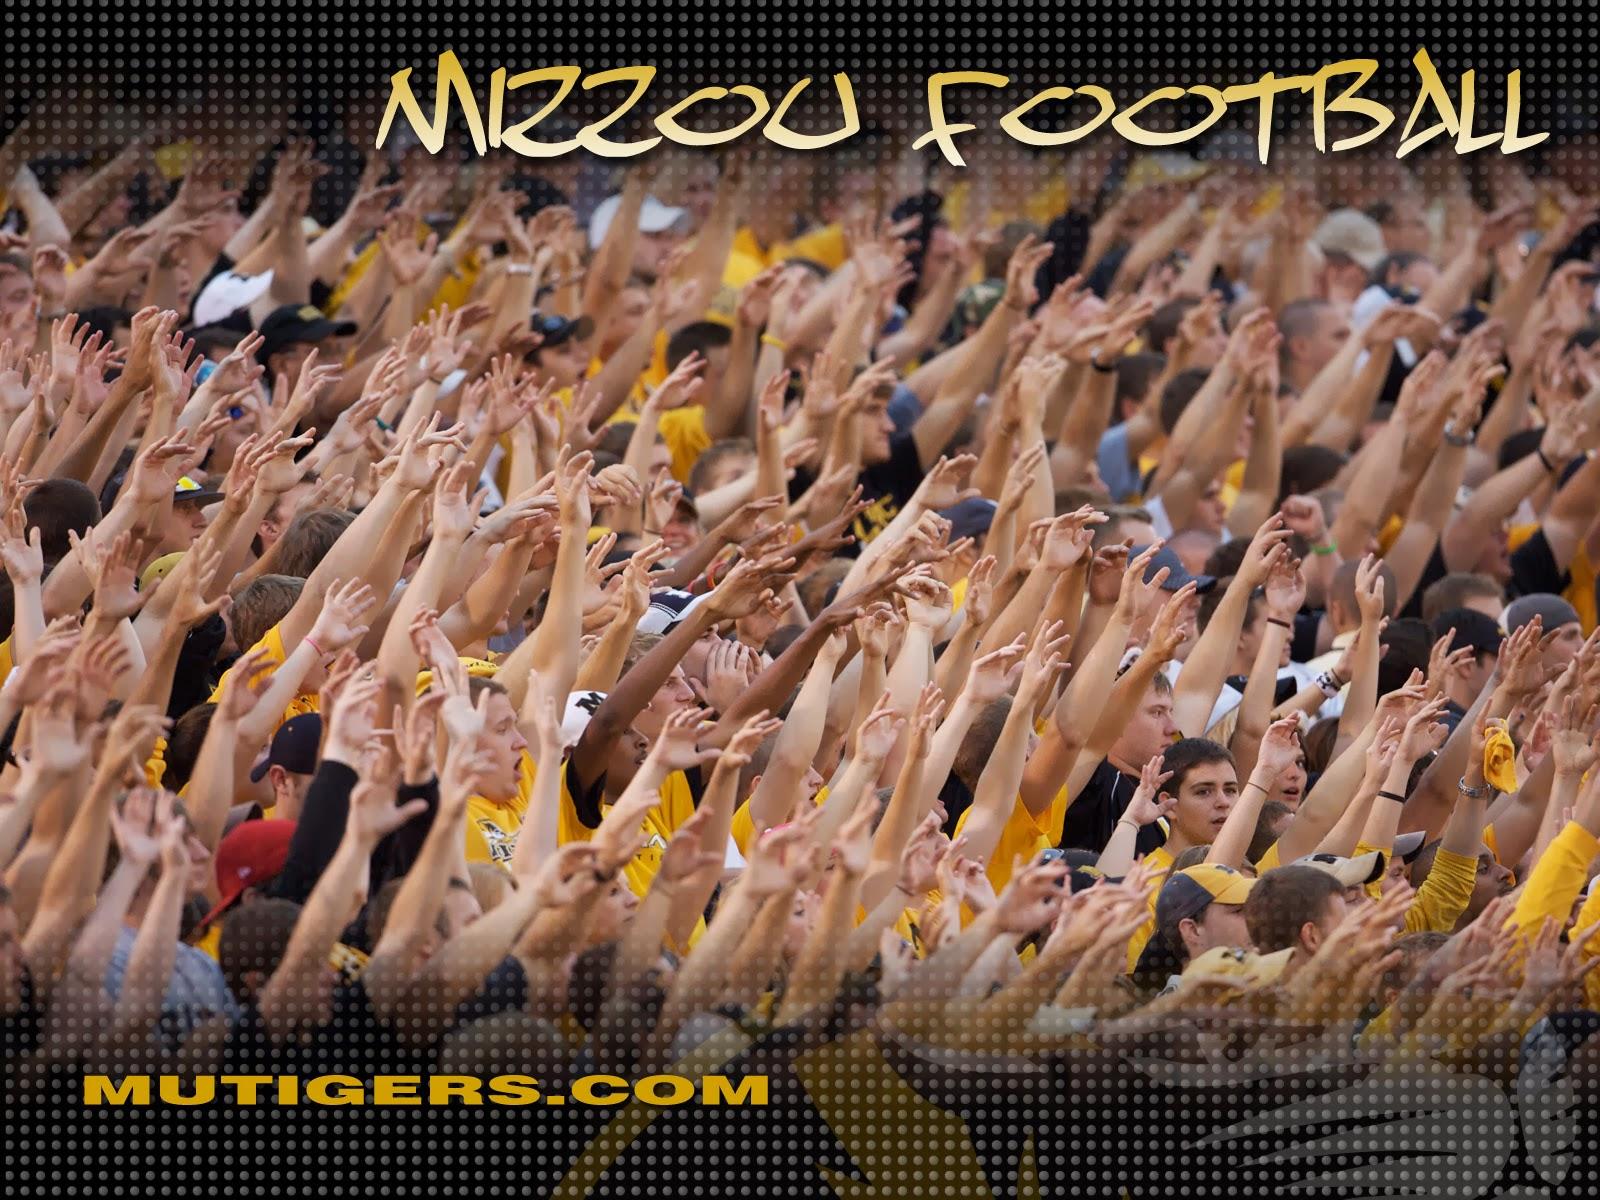 Mizzou Football Wallpapers   HD Wallpapers Nice HD Wallpapers 1080p 1600x1200